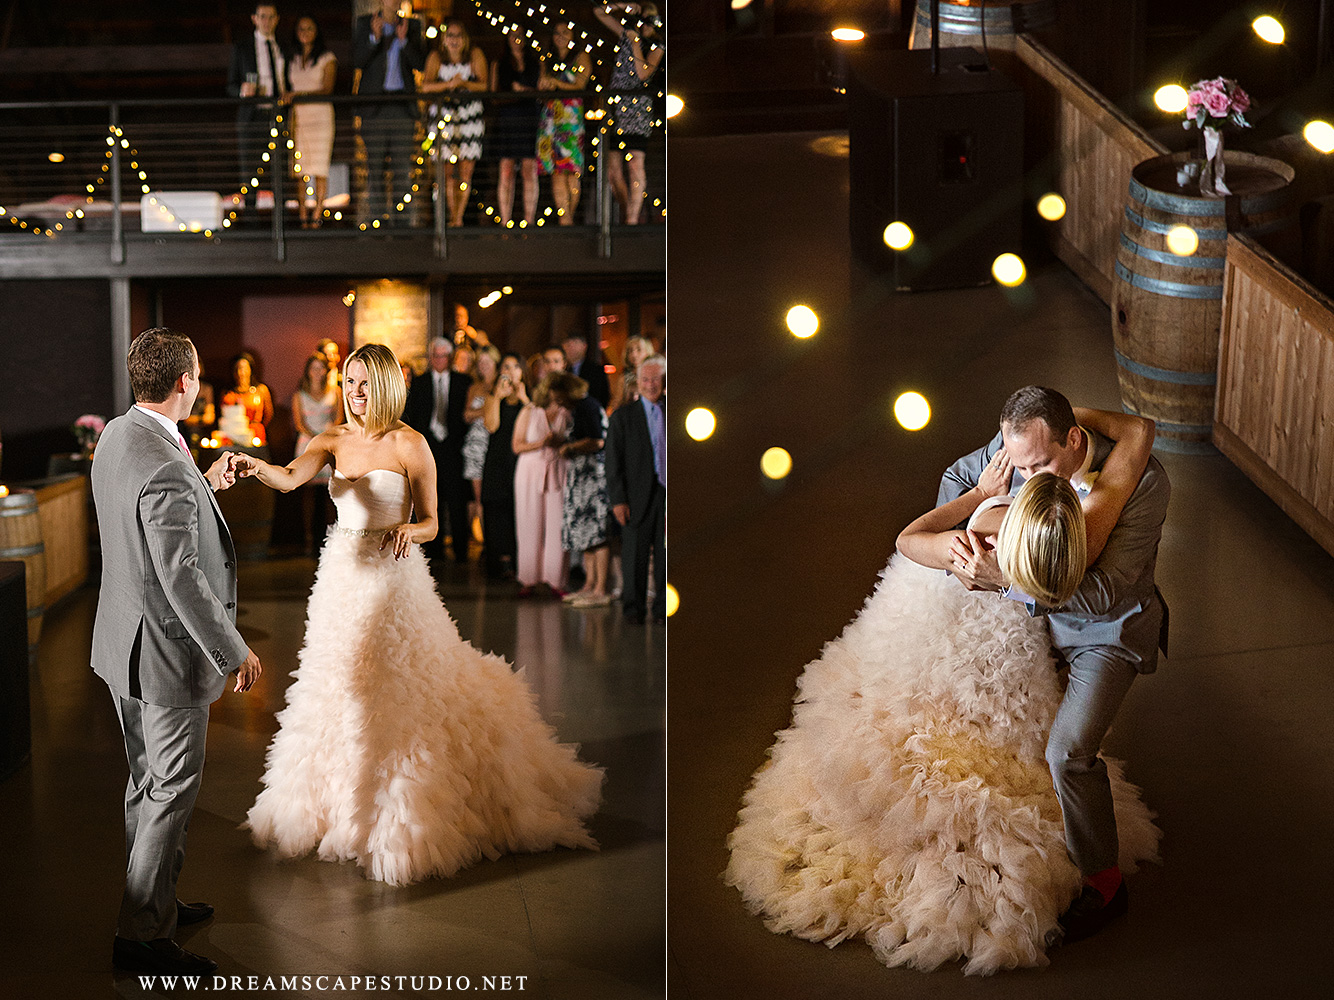 CT_Wedding_Photographer_ZBJi_Blg_26.jpg